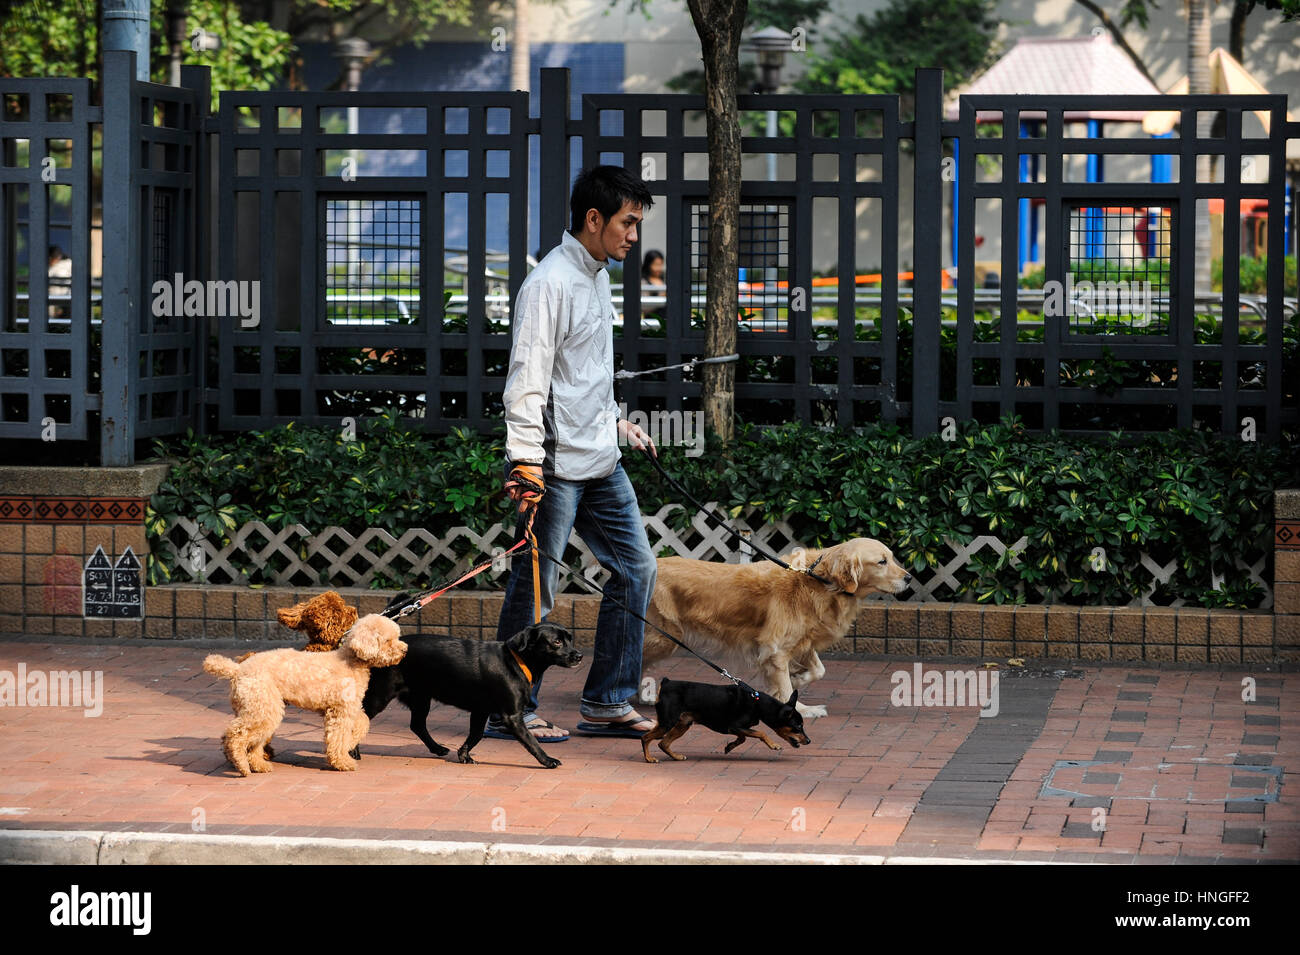 CHINA, Megacity Hong Kong, Kowloon, pedestrian with five dogs - Stock Image